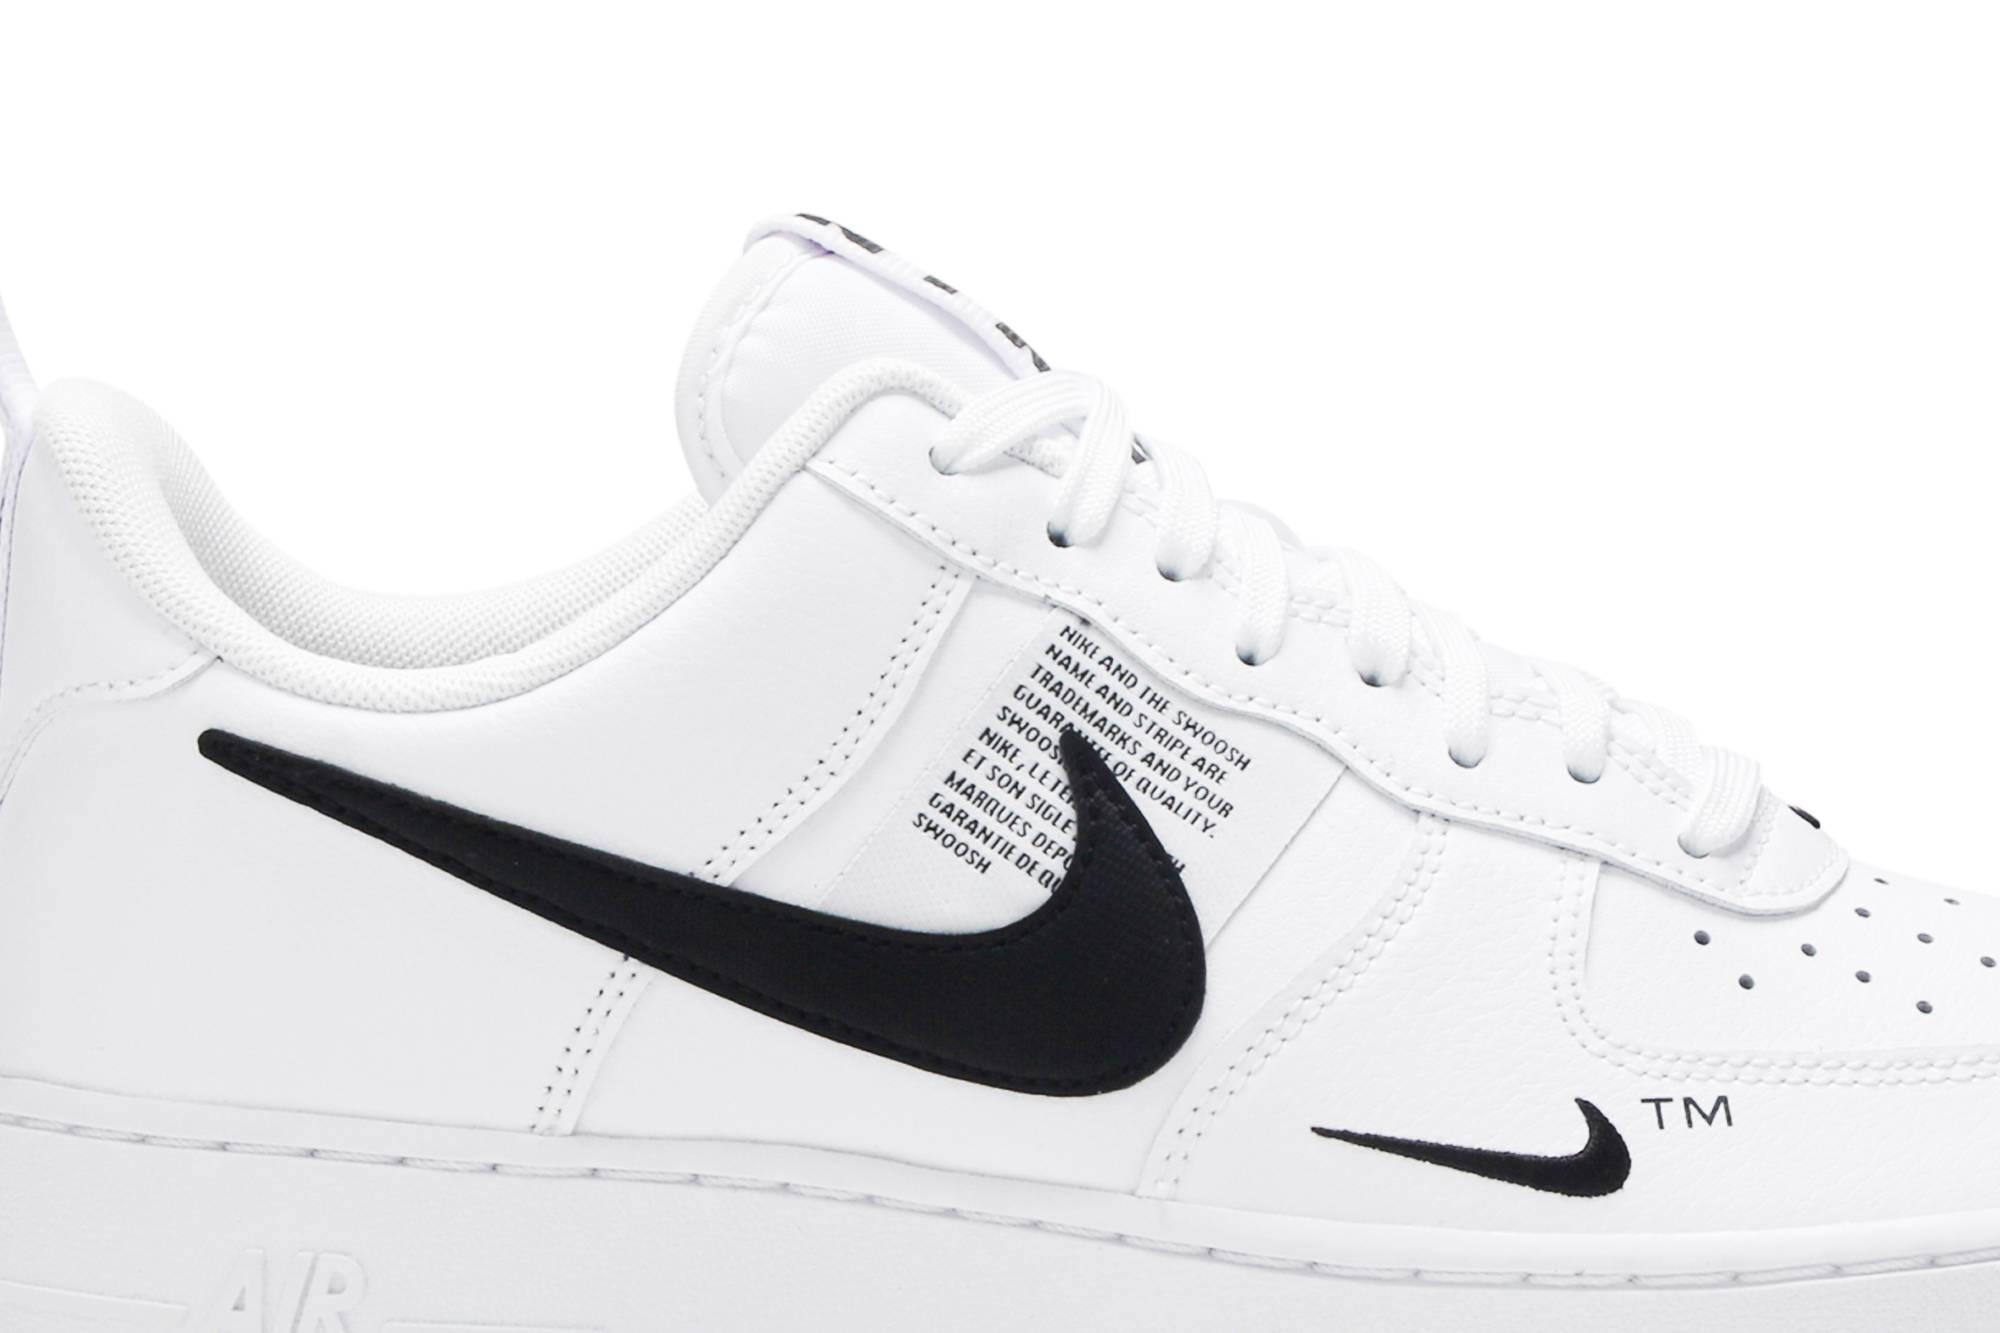 Nike Air Force 1 LV8 Utility 'White